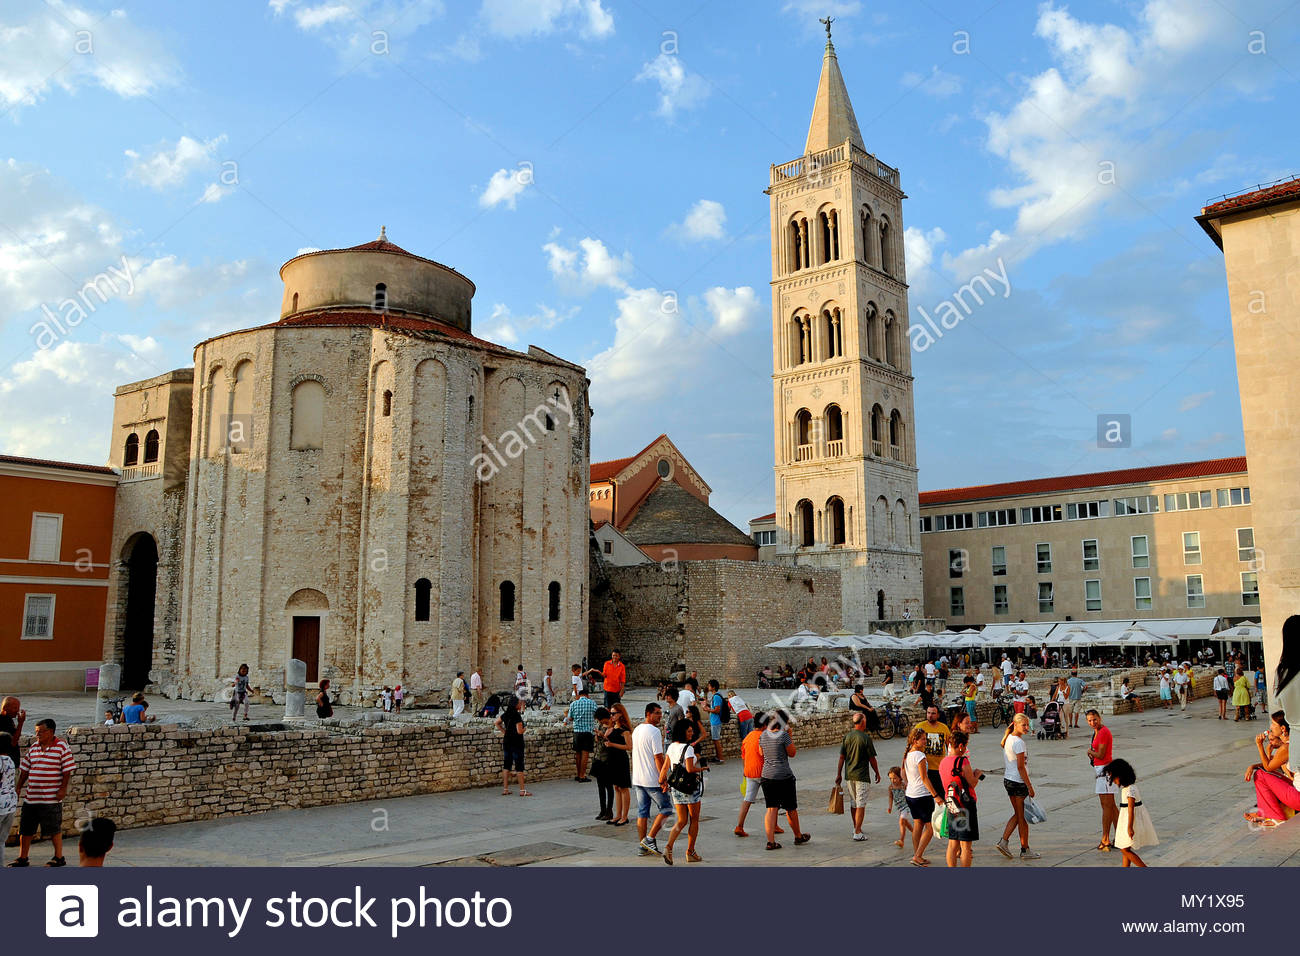 Church of St. Donatus is a church located in Zadar, Croatia Stock Photo